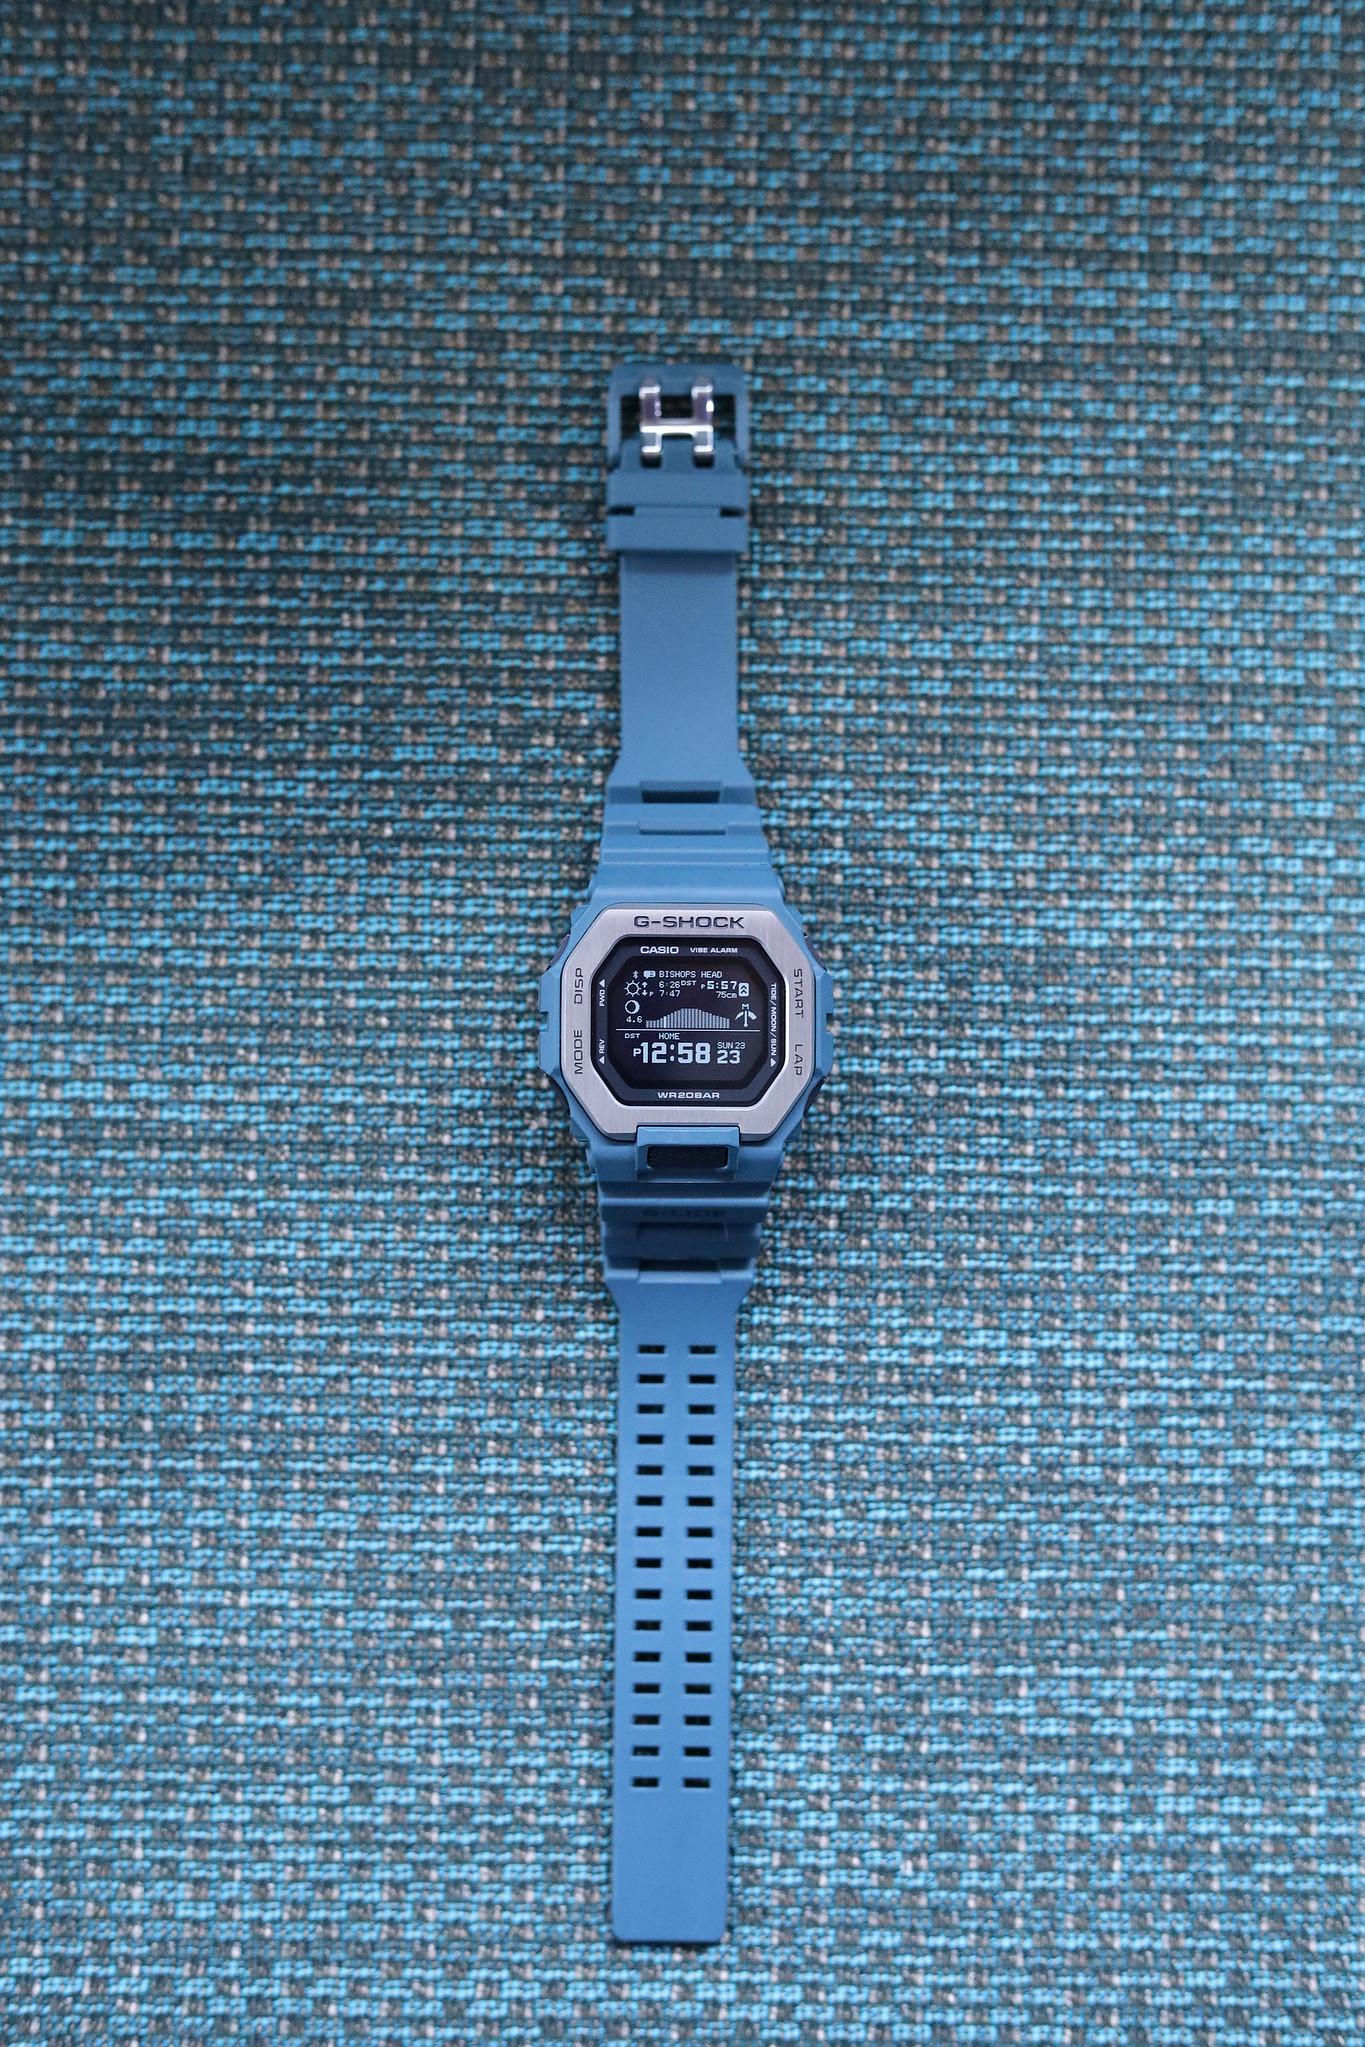 G-Shock G-Lide GBX100-2 overhead